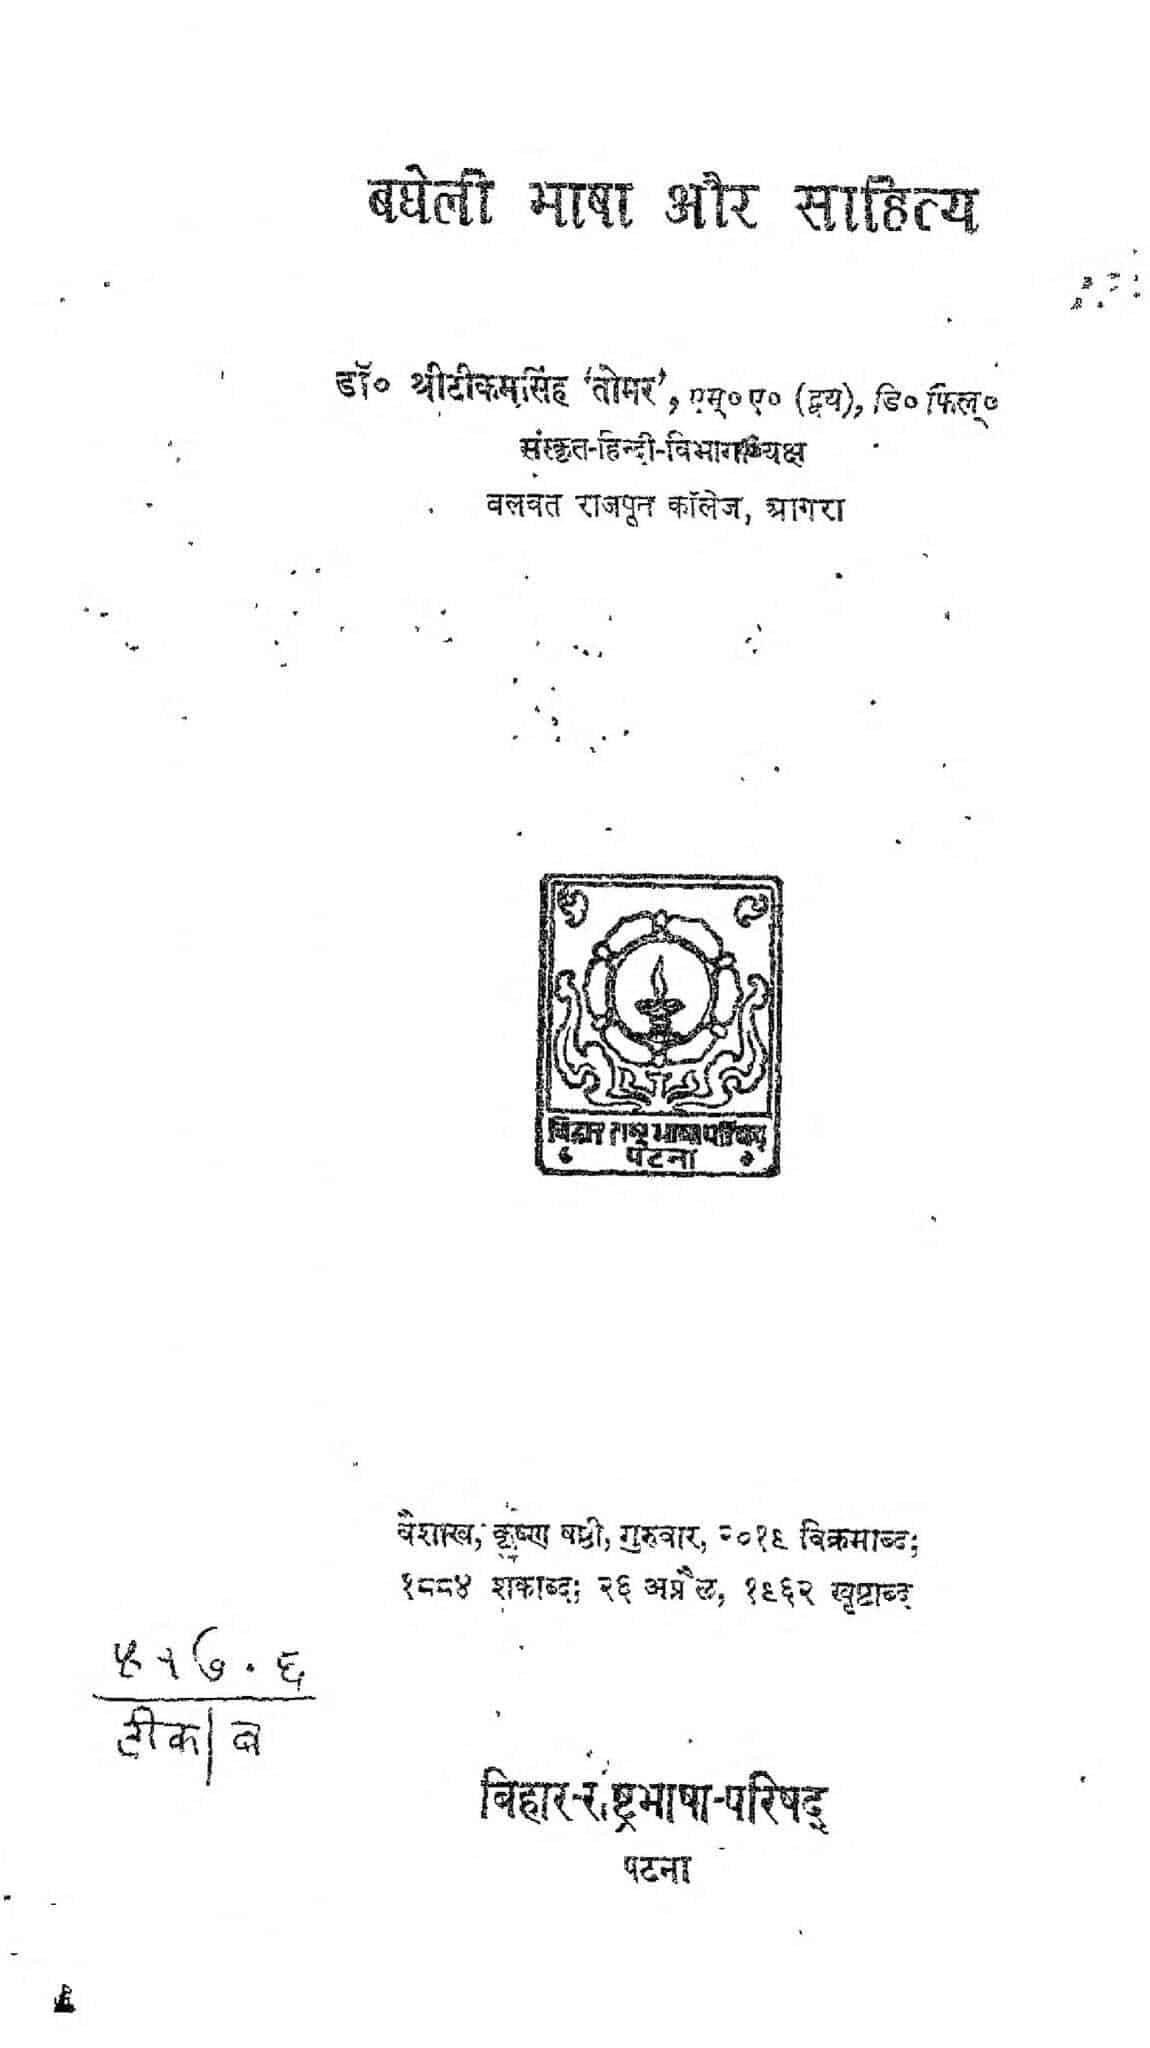 Book Image : बघेली भाषा और साहित्य  - Bagheli Bhasha Aur Sahitya